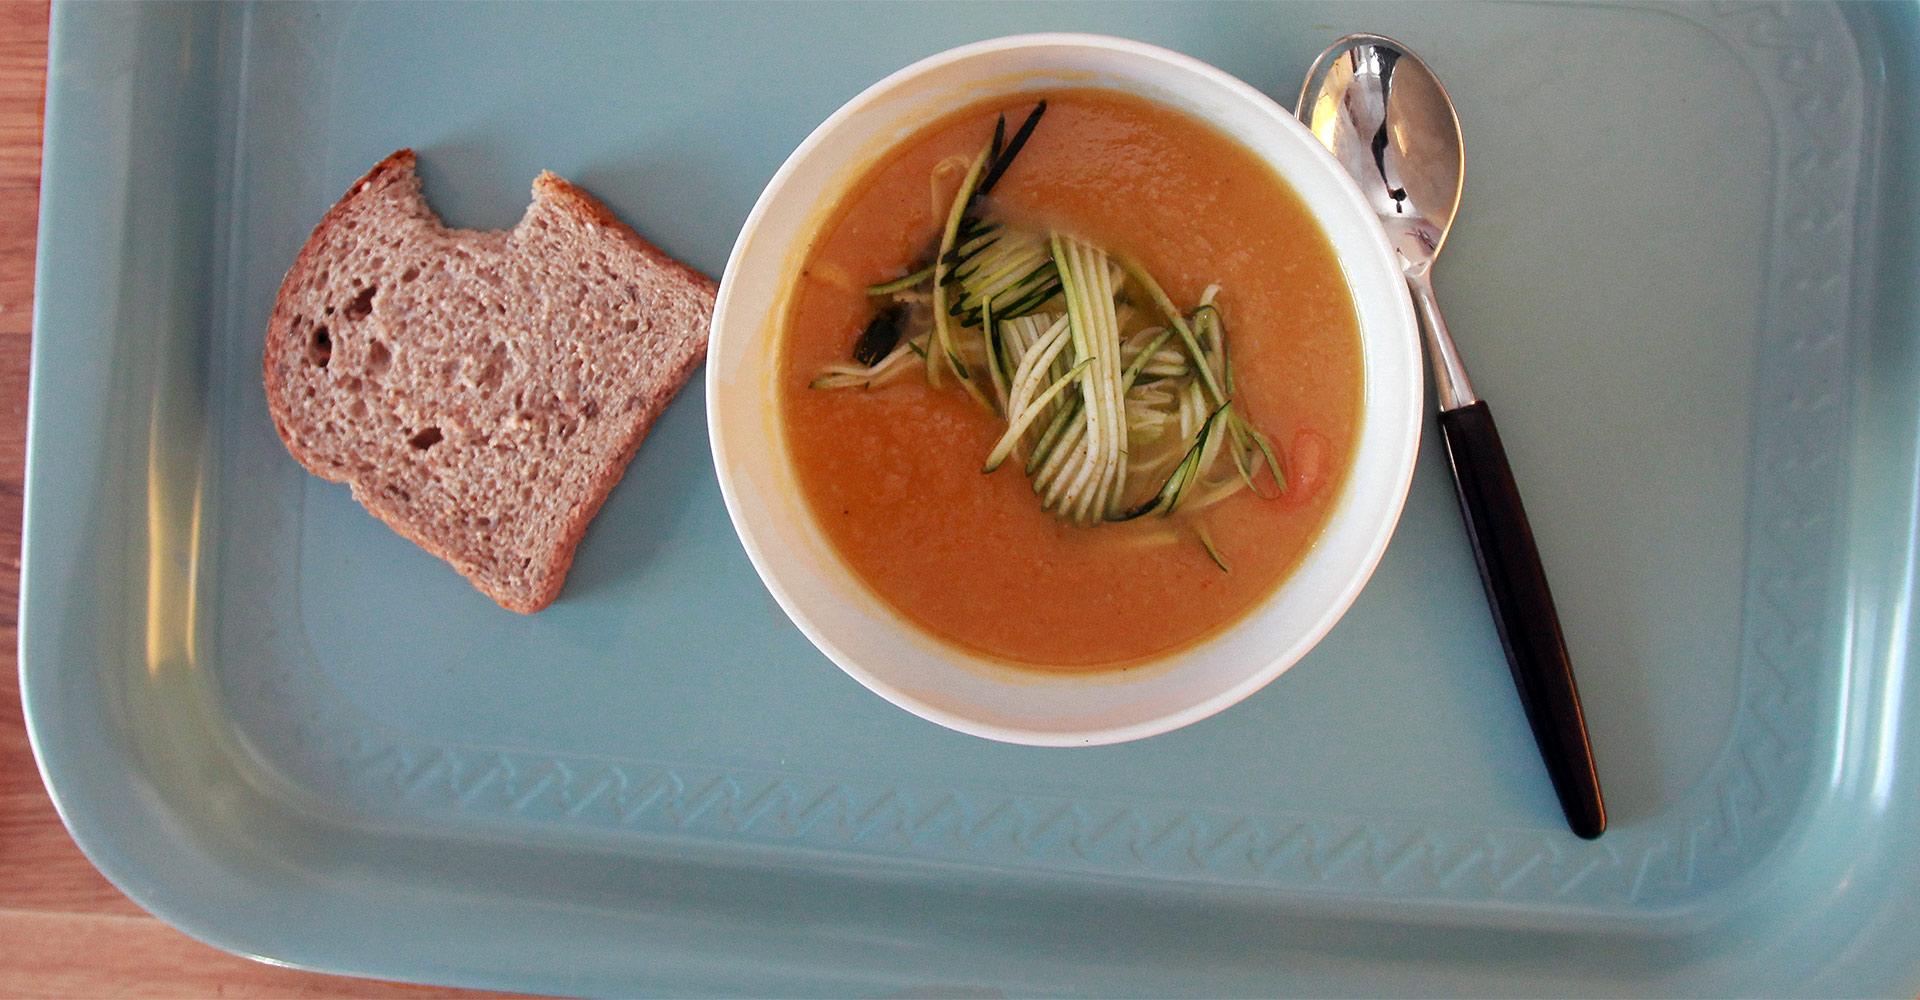 picutre of a bowl of soup